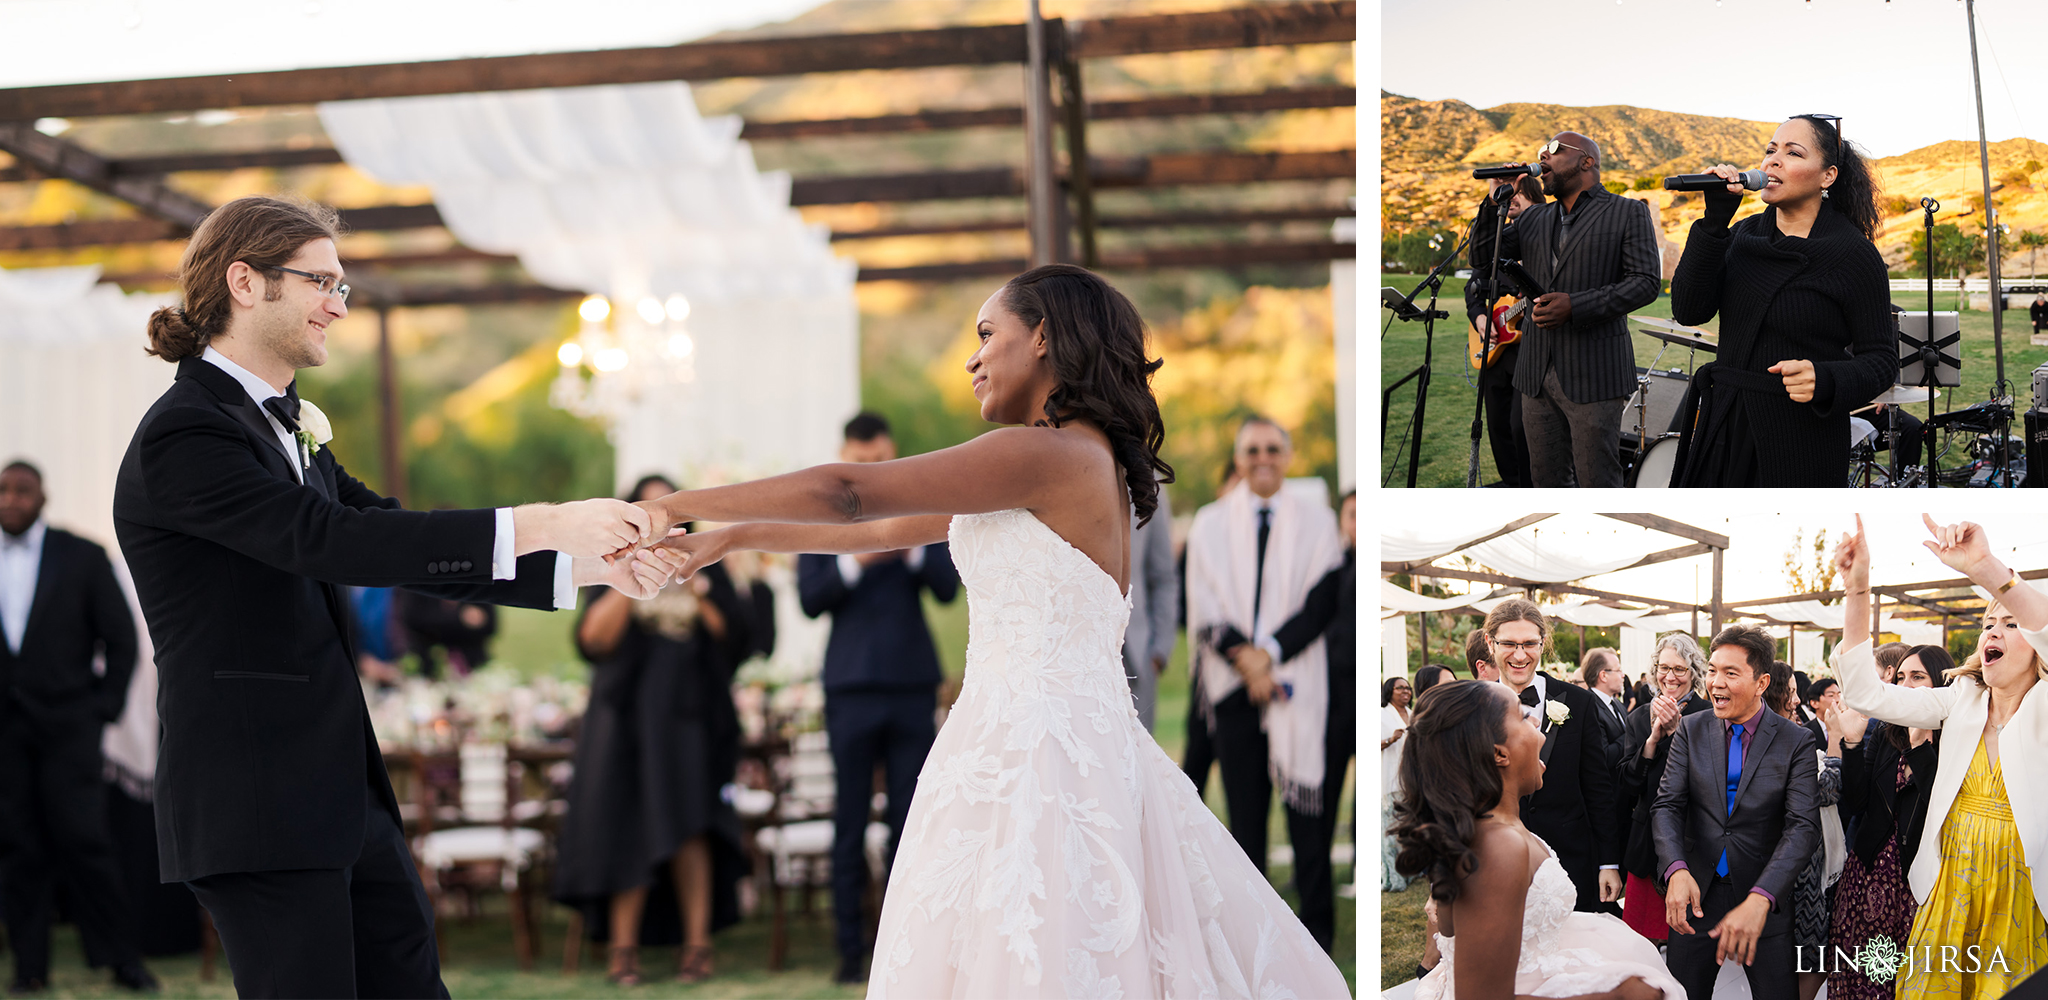 32 Hummingbird Nest Ranch Simi Valley Wedding Photography